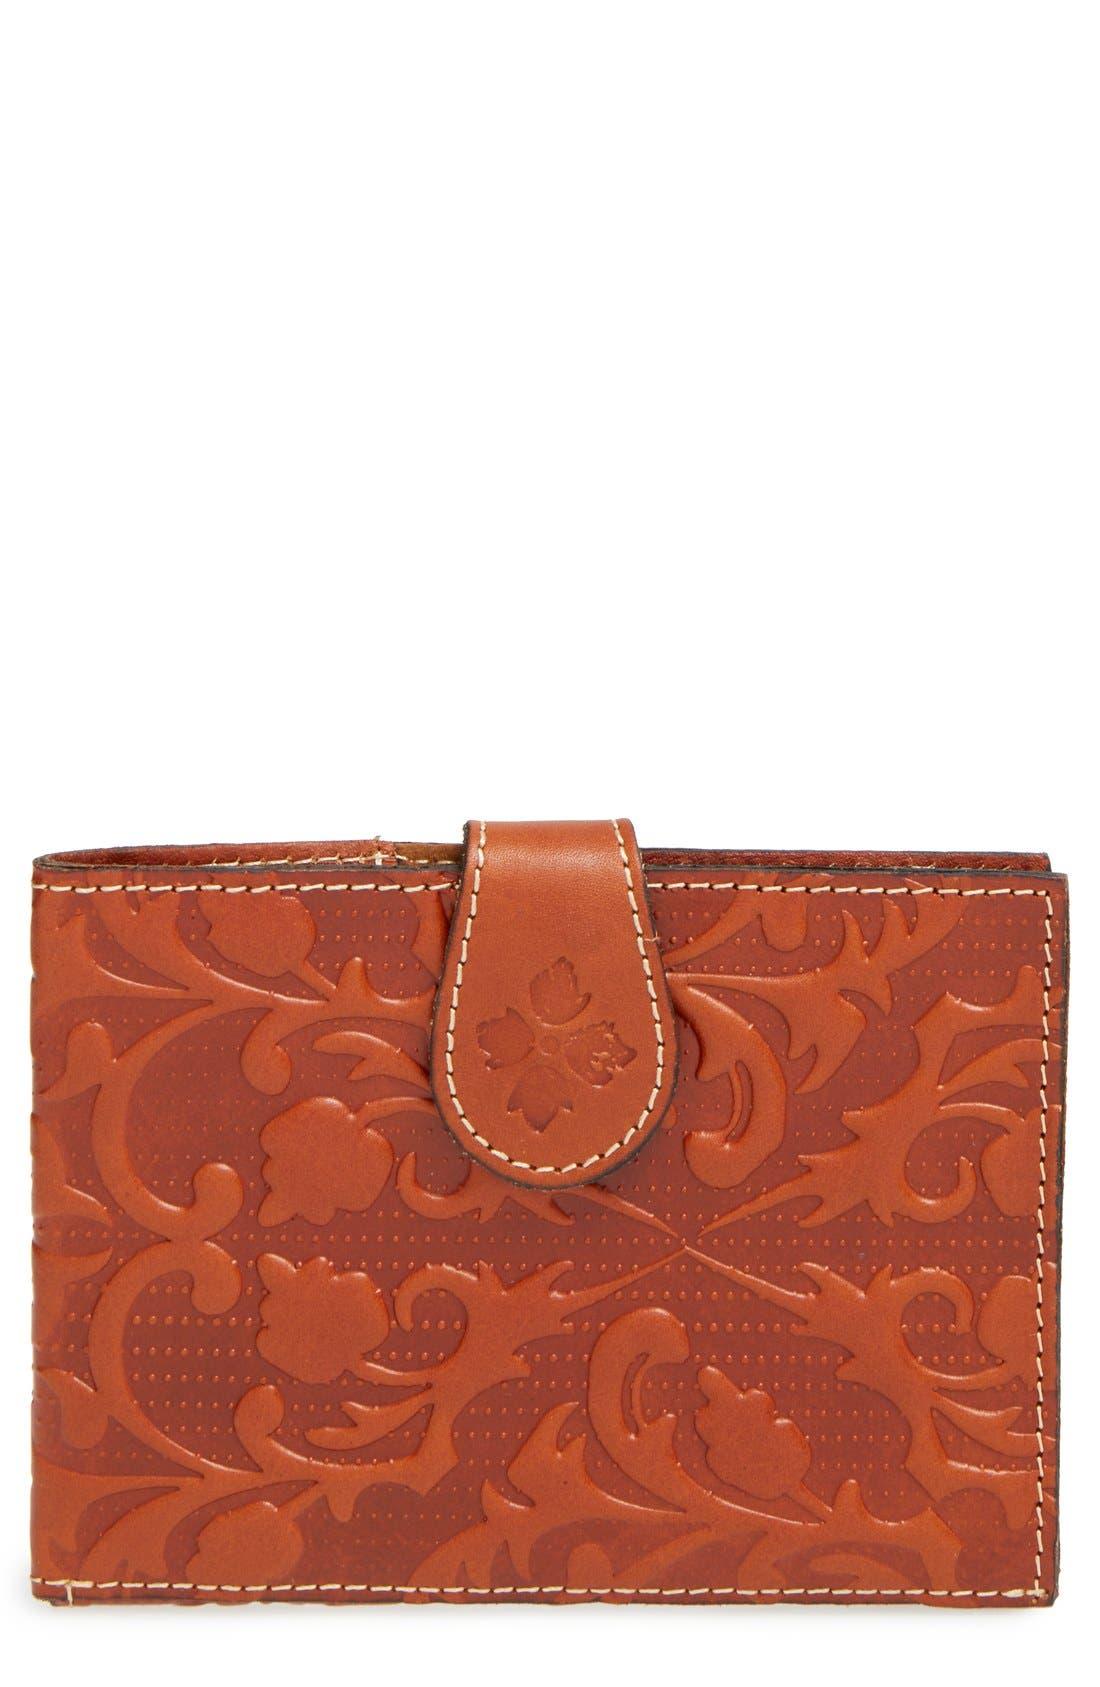 Alternate Image 1 Selected - Patricia Nash Passport Wallet